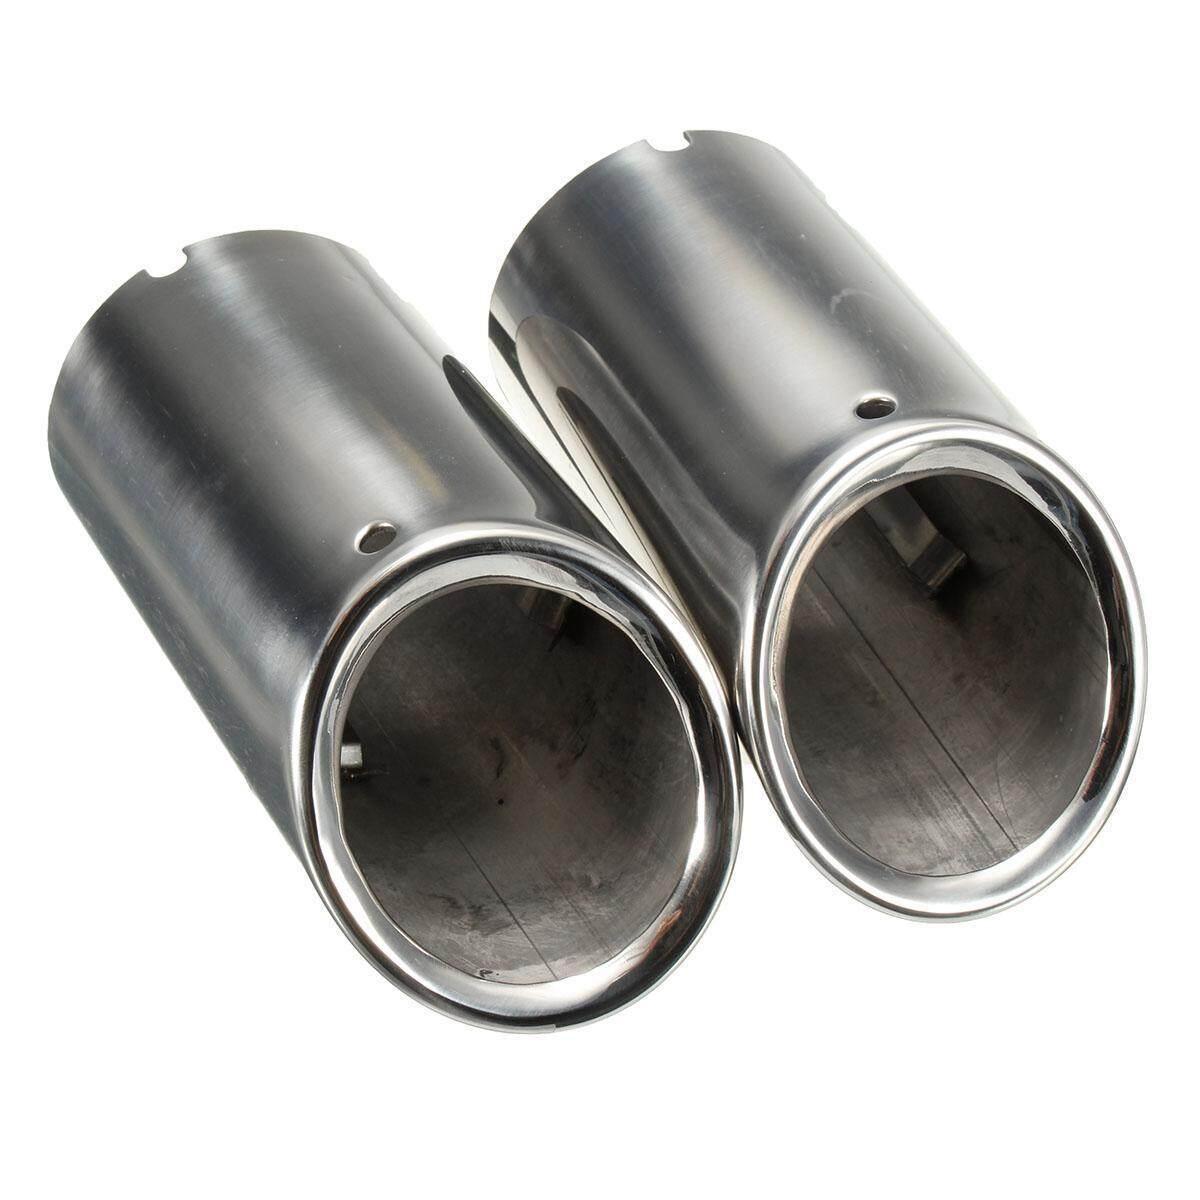 2Pcs Set Muffler Exhaust Tail Pipe Tip Chrome For BMW E90 E92 325 3 Series 06-10